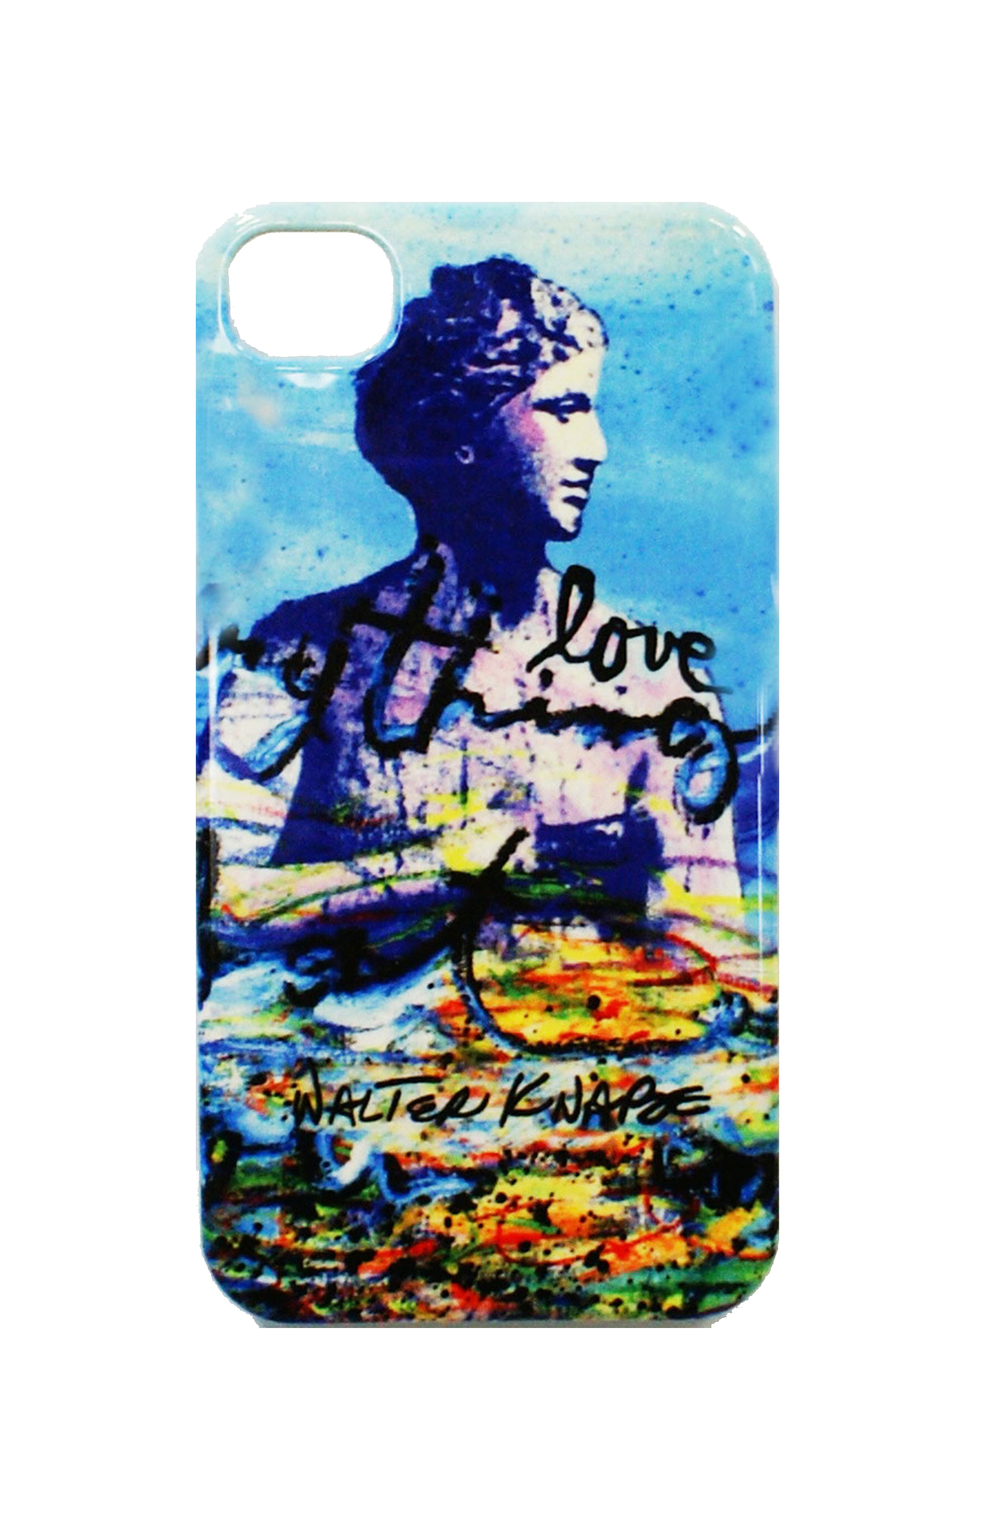 Statue-Blue-phone-case.jpg